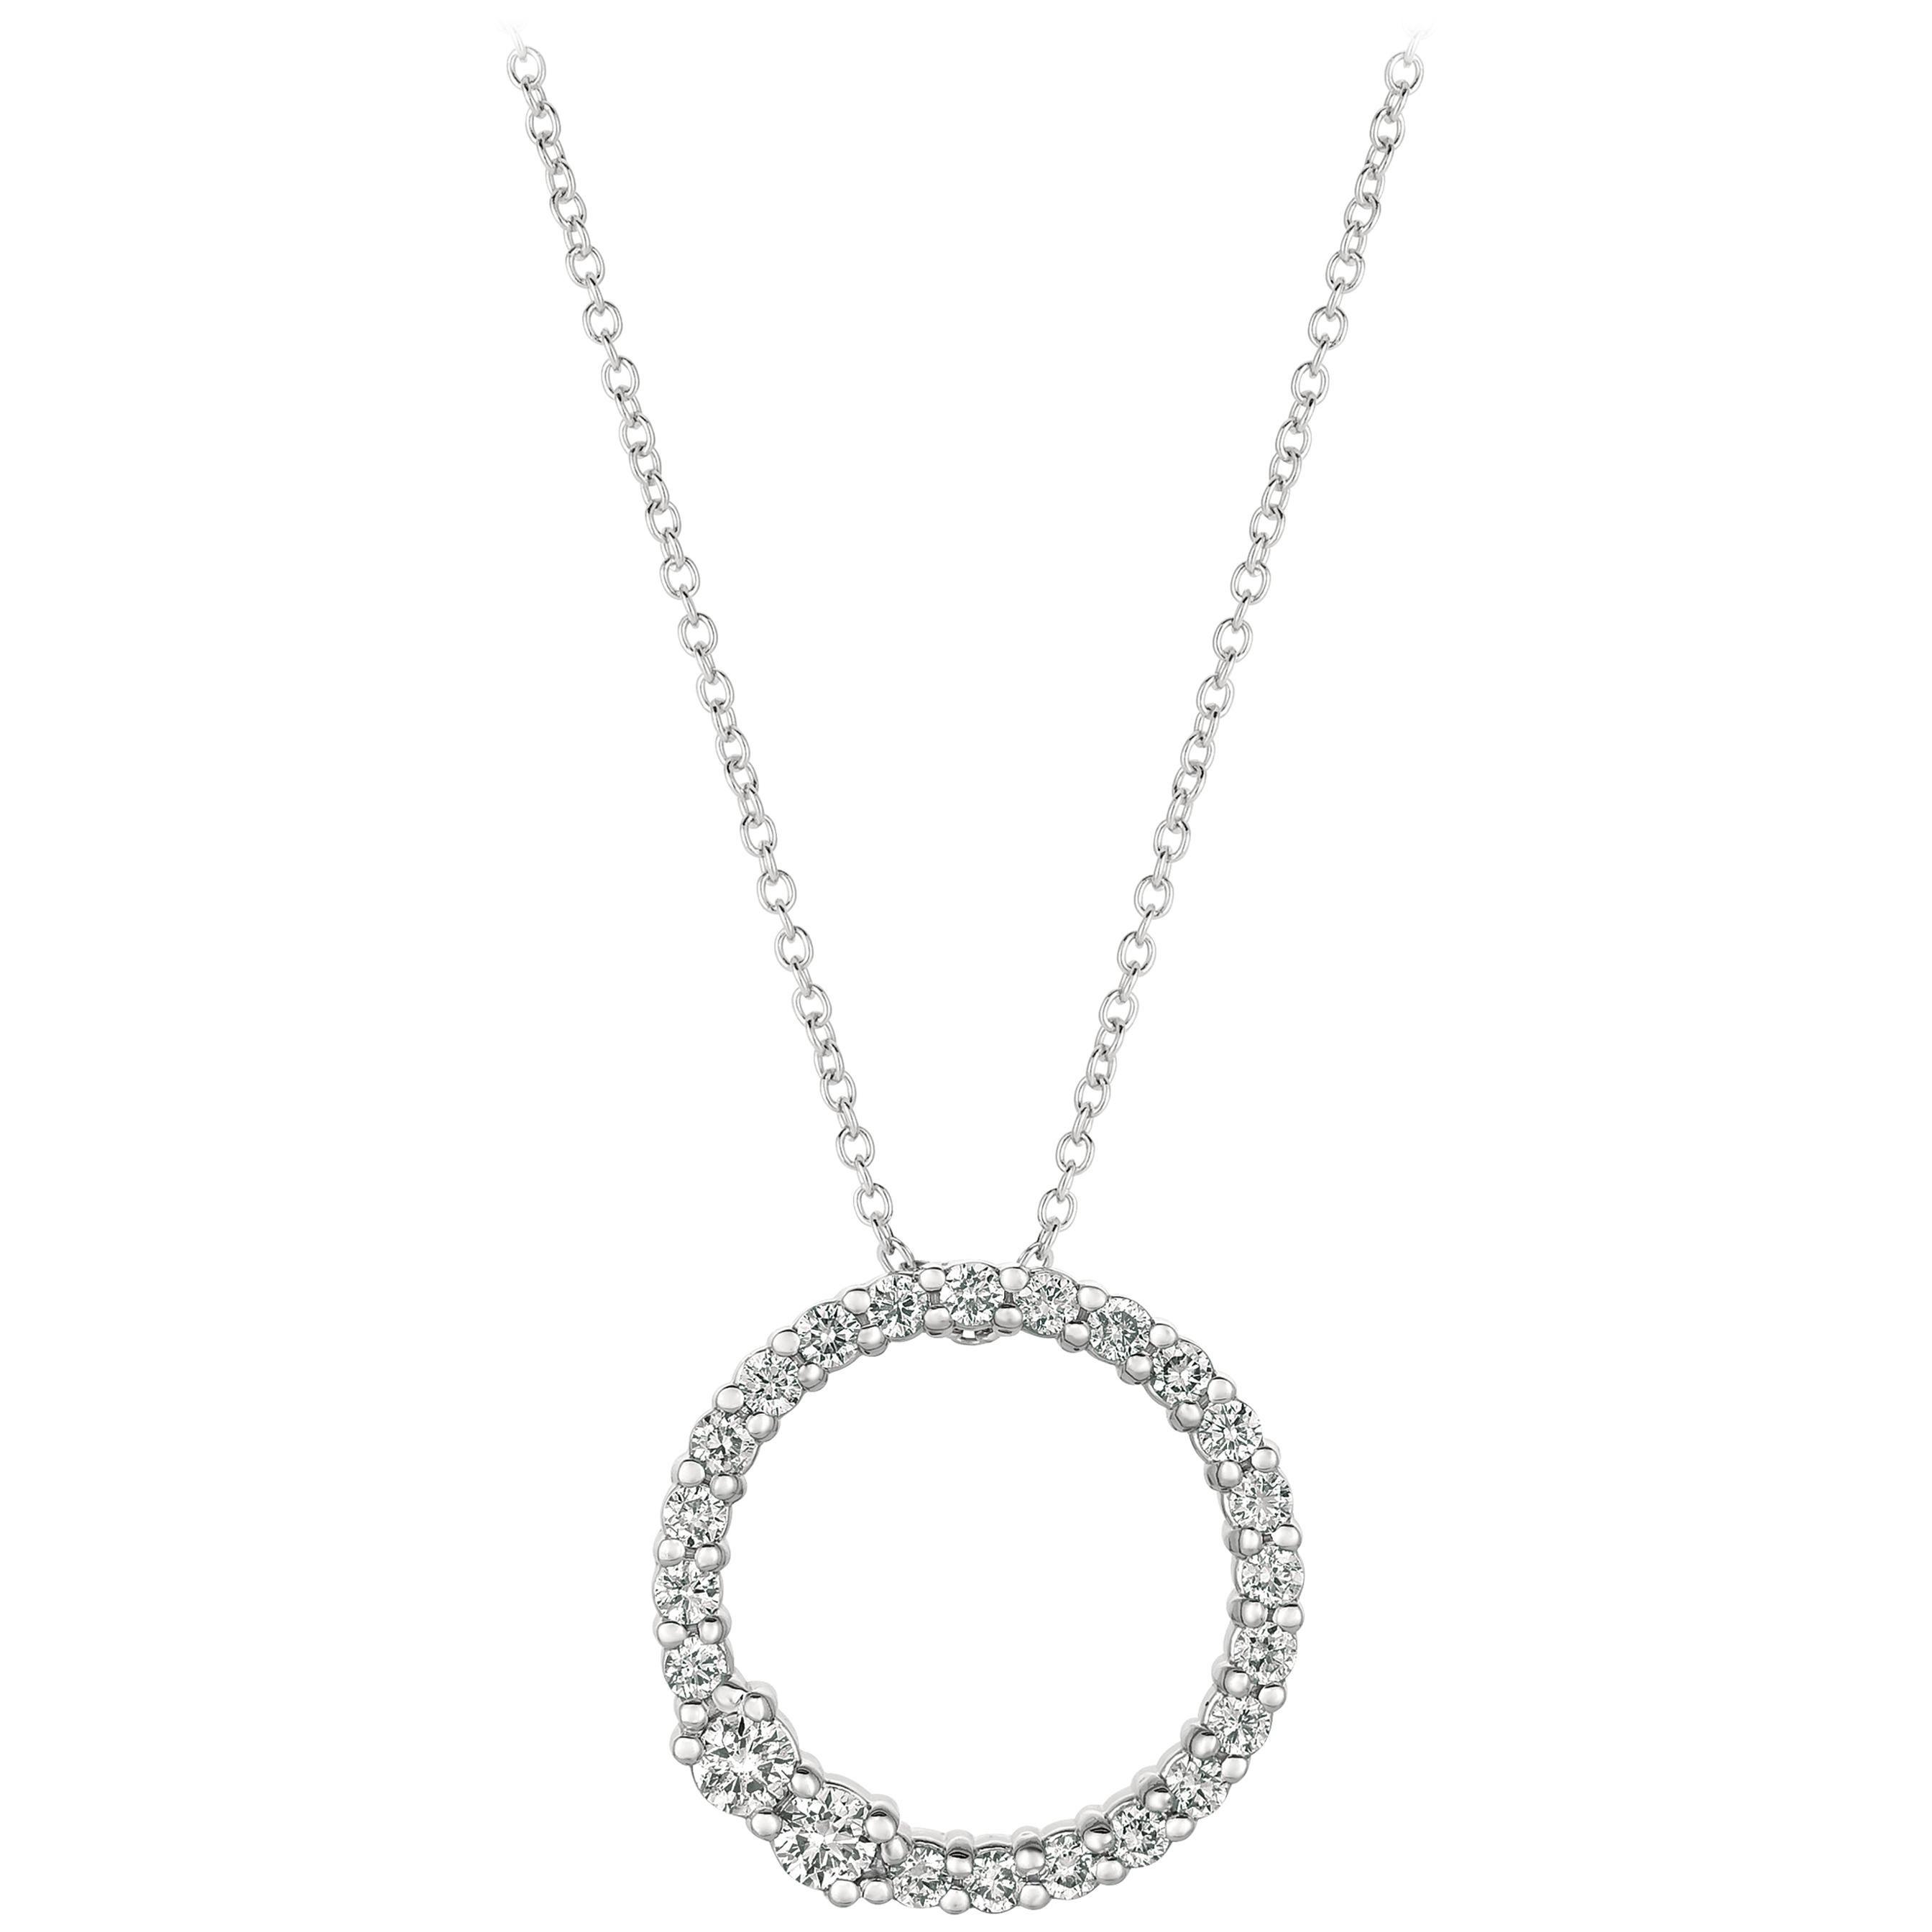 0.75 Carat Natural Diamond Circle Necklace 14 Karat White Gold G-H SI Chain